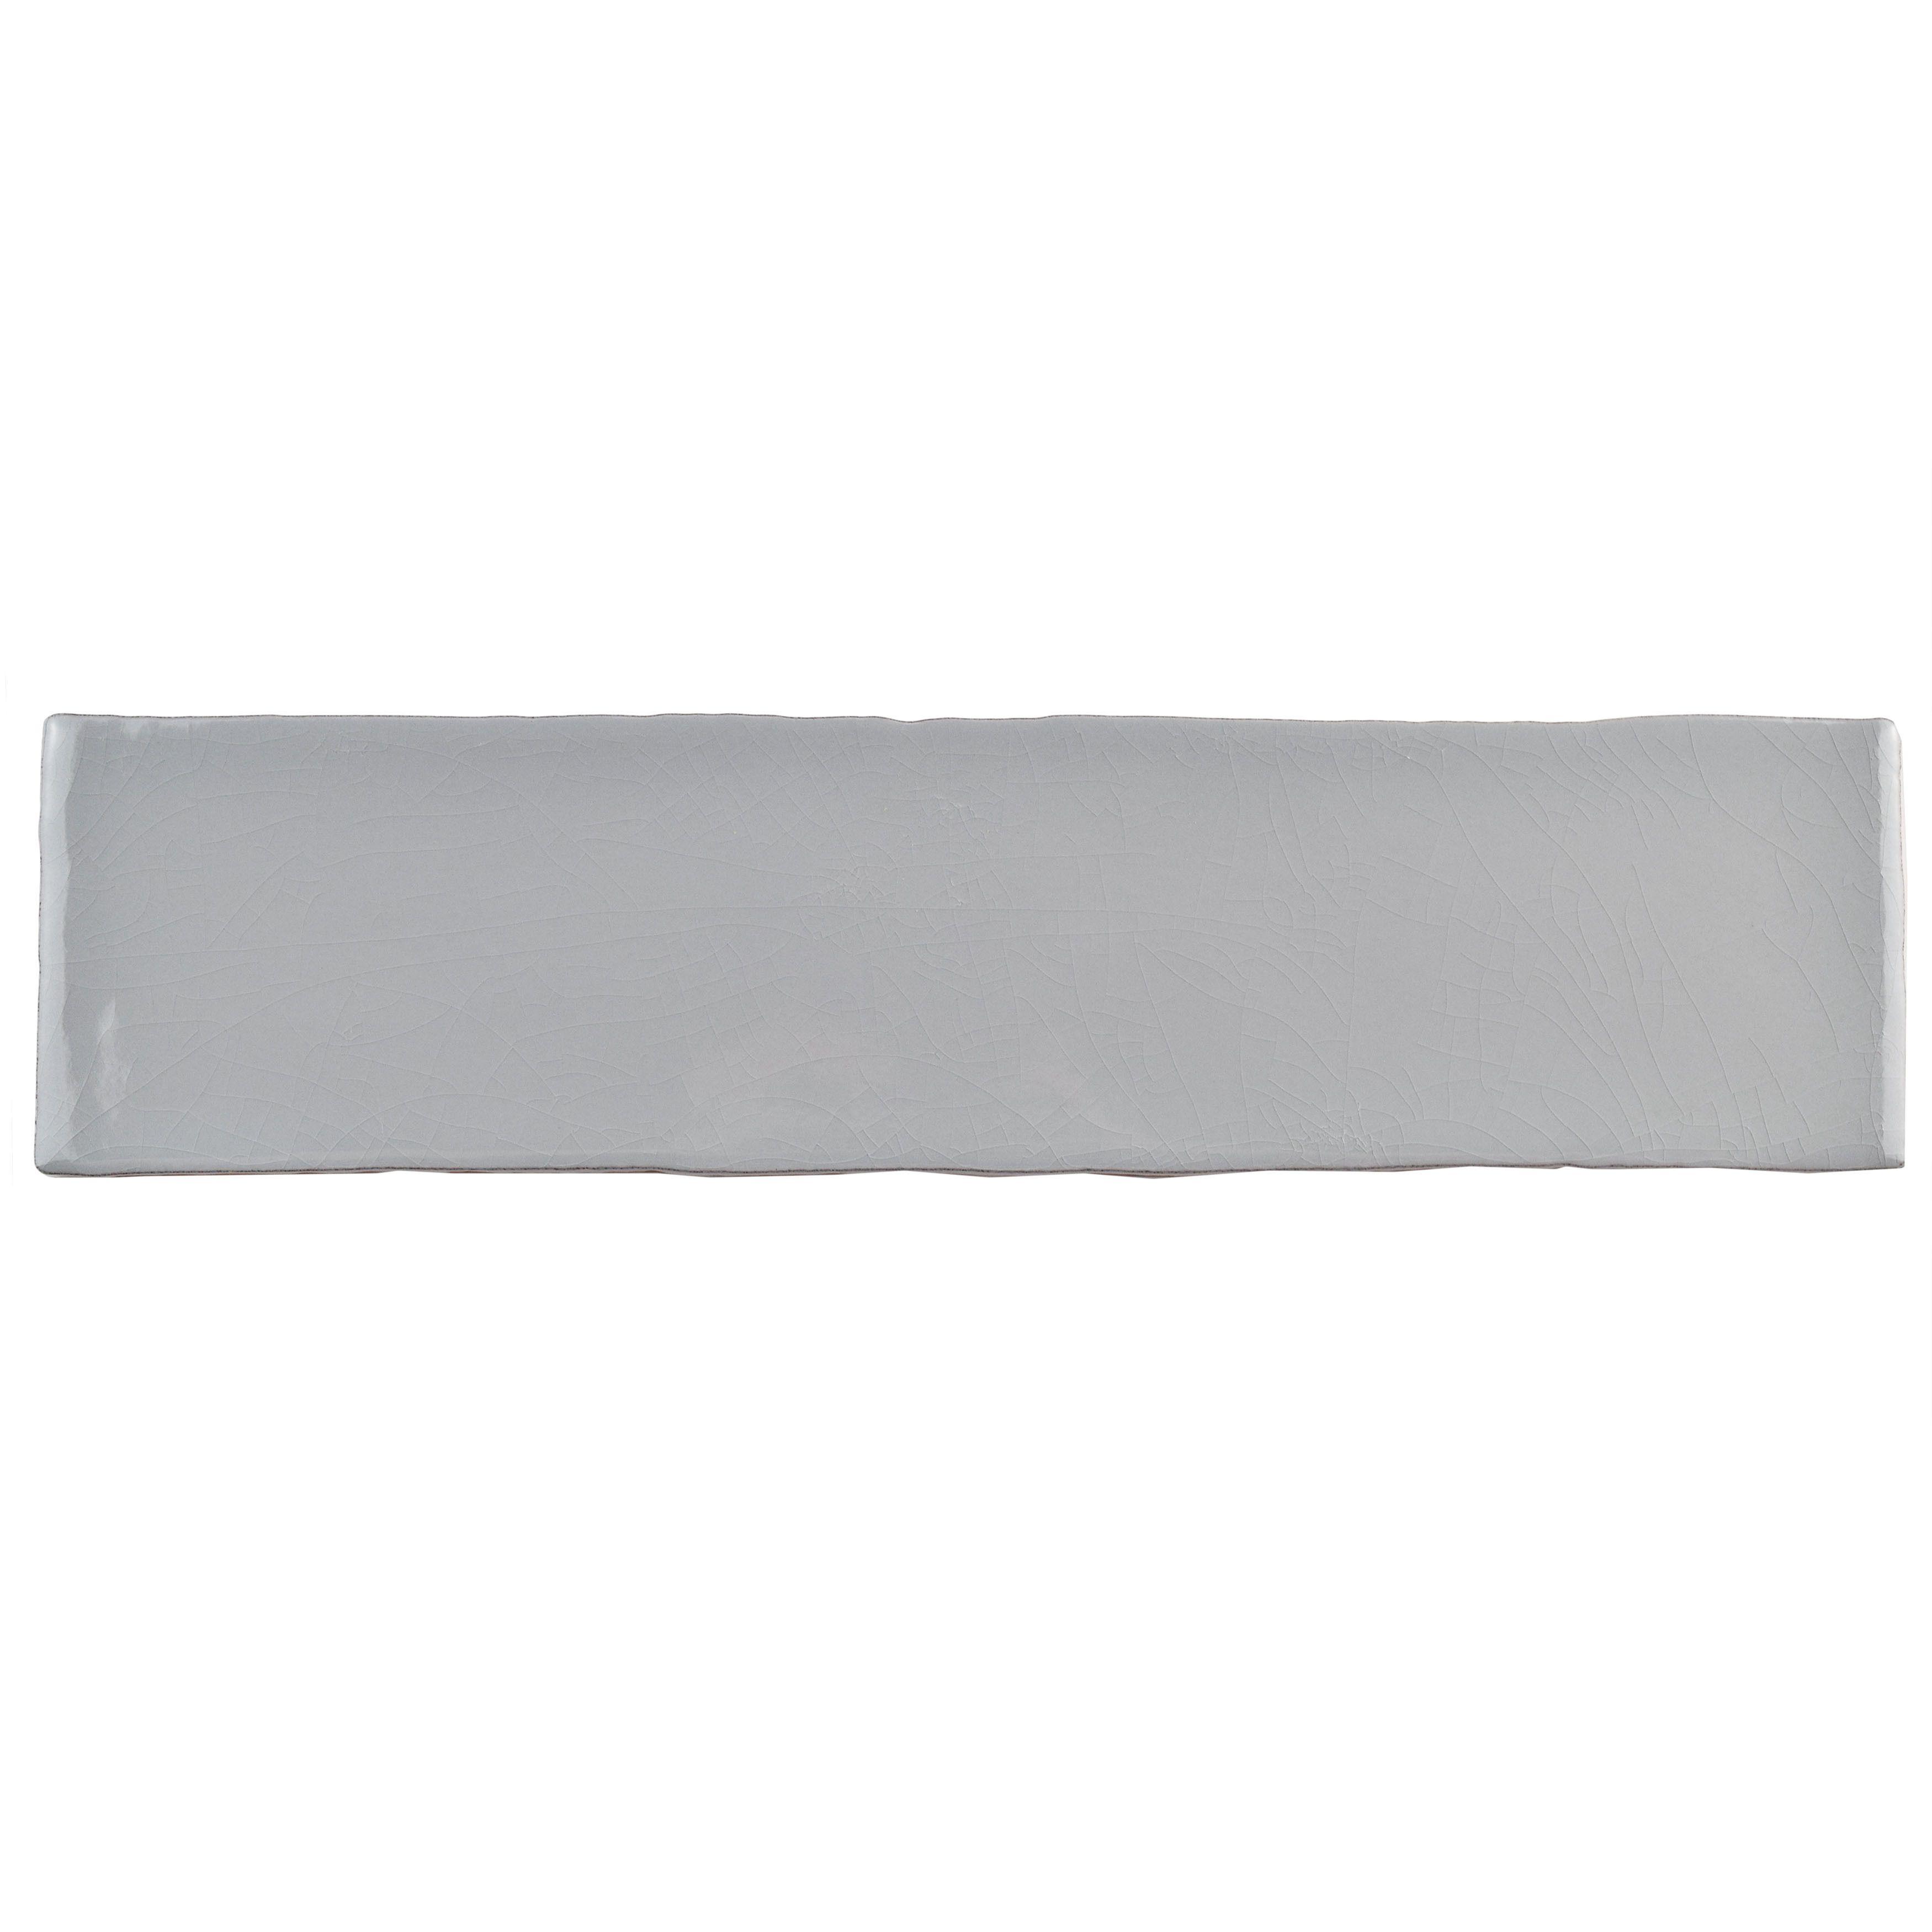 The somertile 3x12 inch juneau craquele soho grey ceramic wall the somertile 3x12 inch juneau craquele soho grey ceramic wall tile features a gray crackle dailygadgetfo Gallery